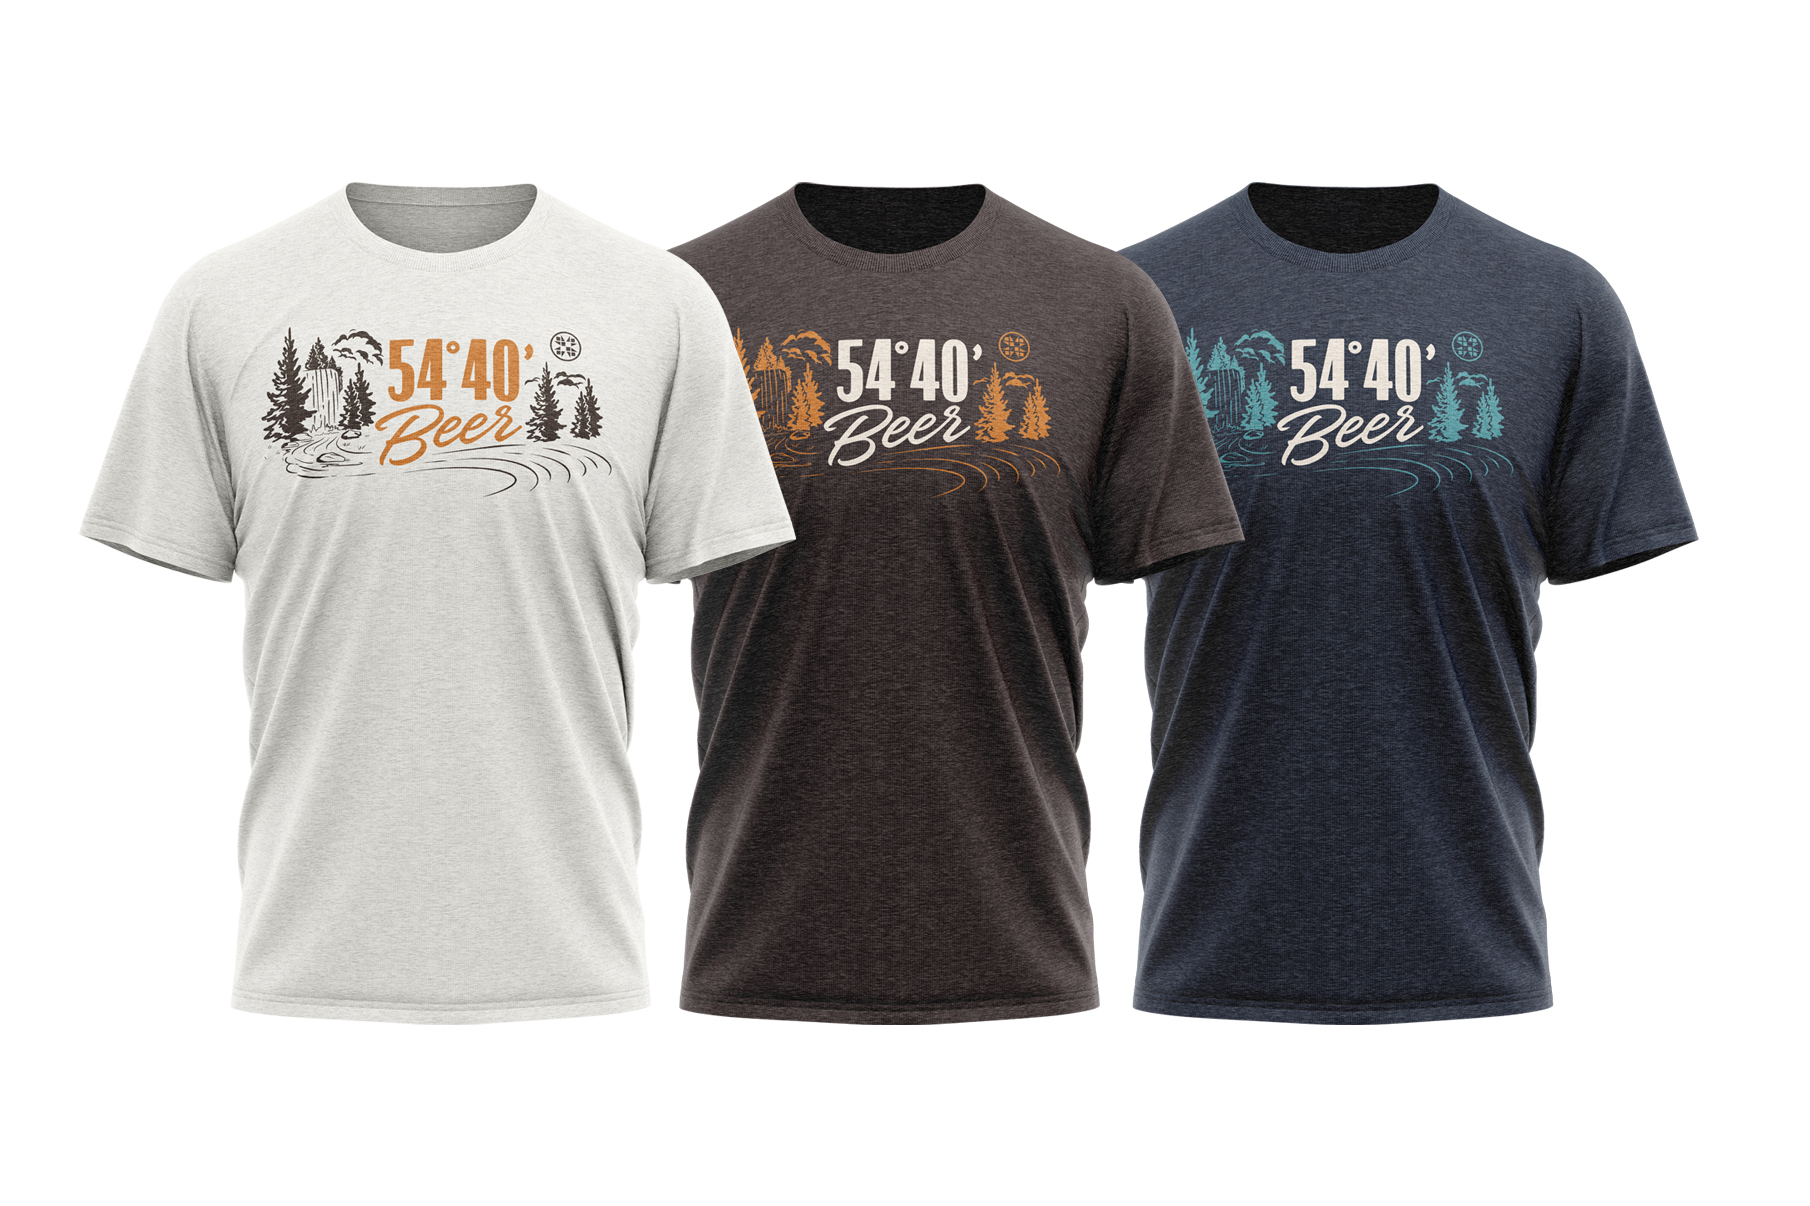 5440_shirts.jpg